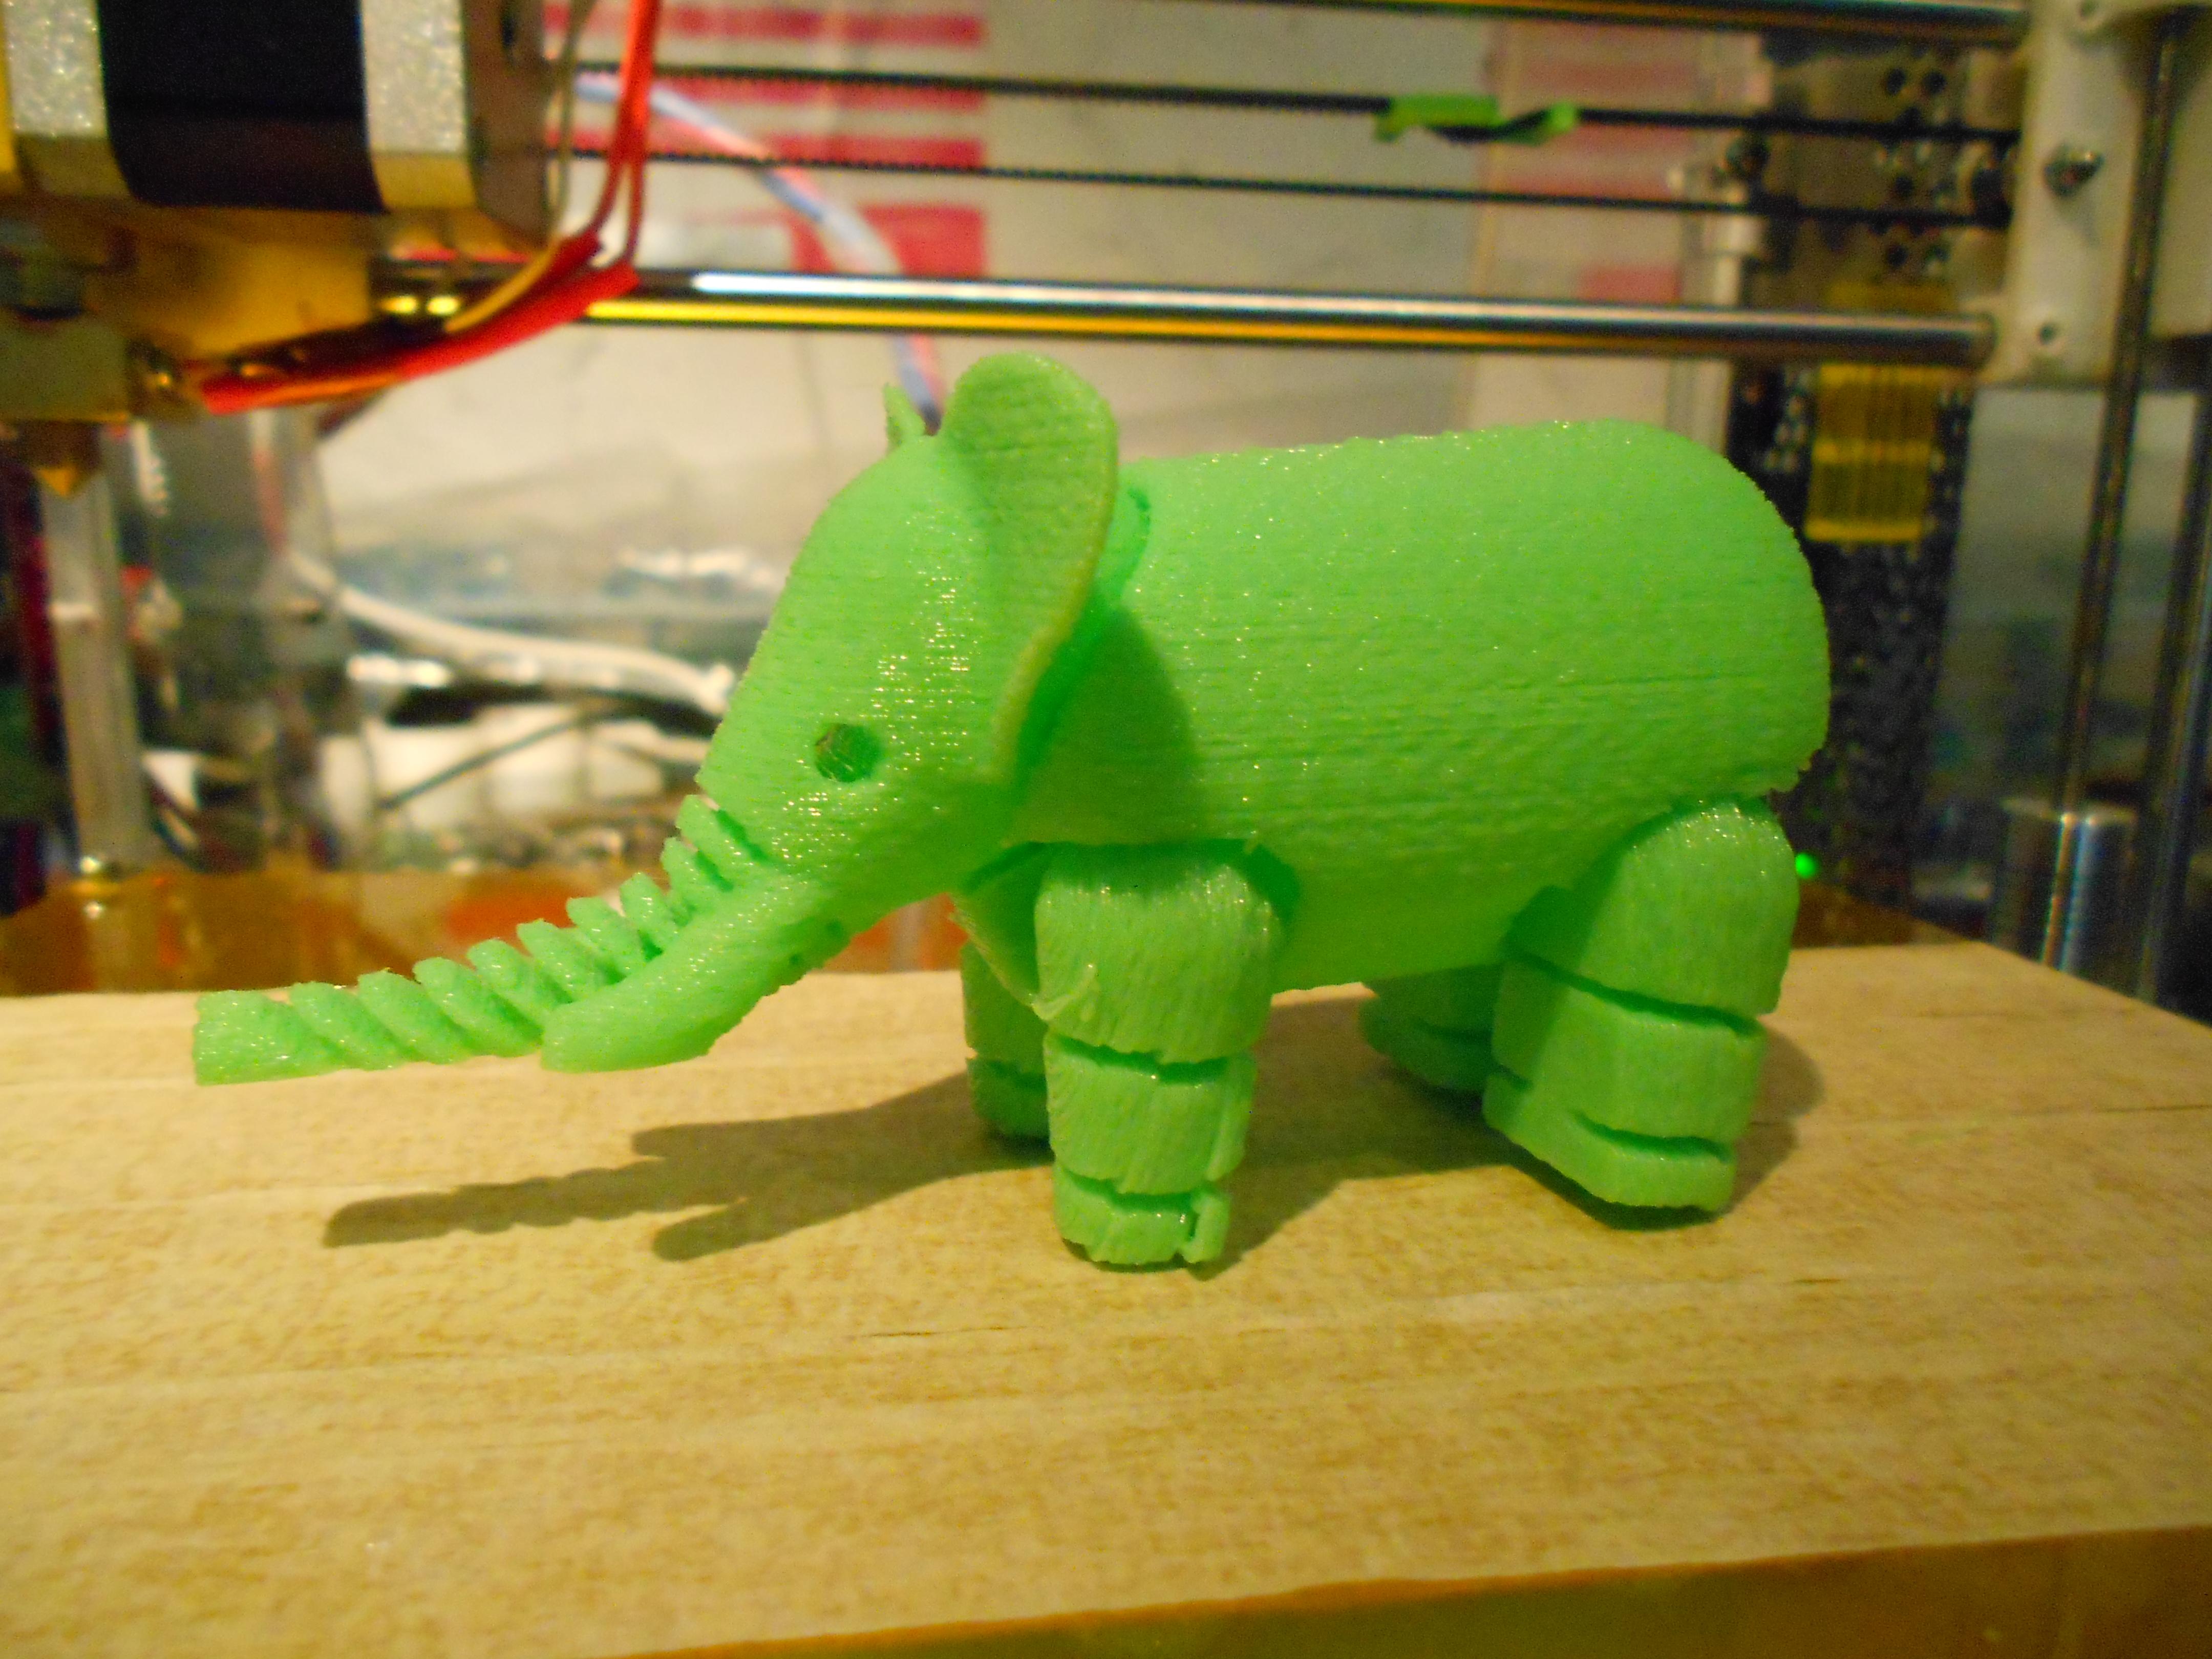 3D printed Elephant.  Image by C13m3n7